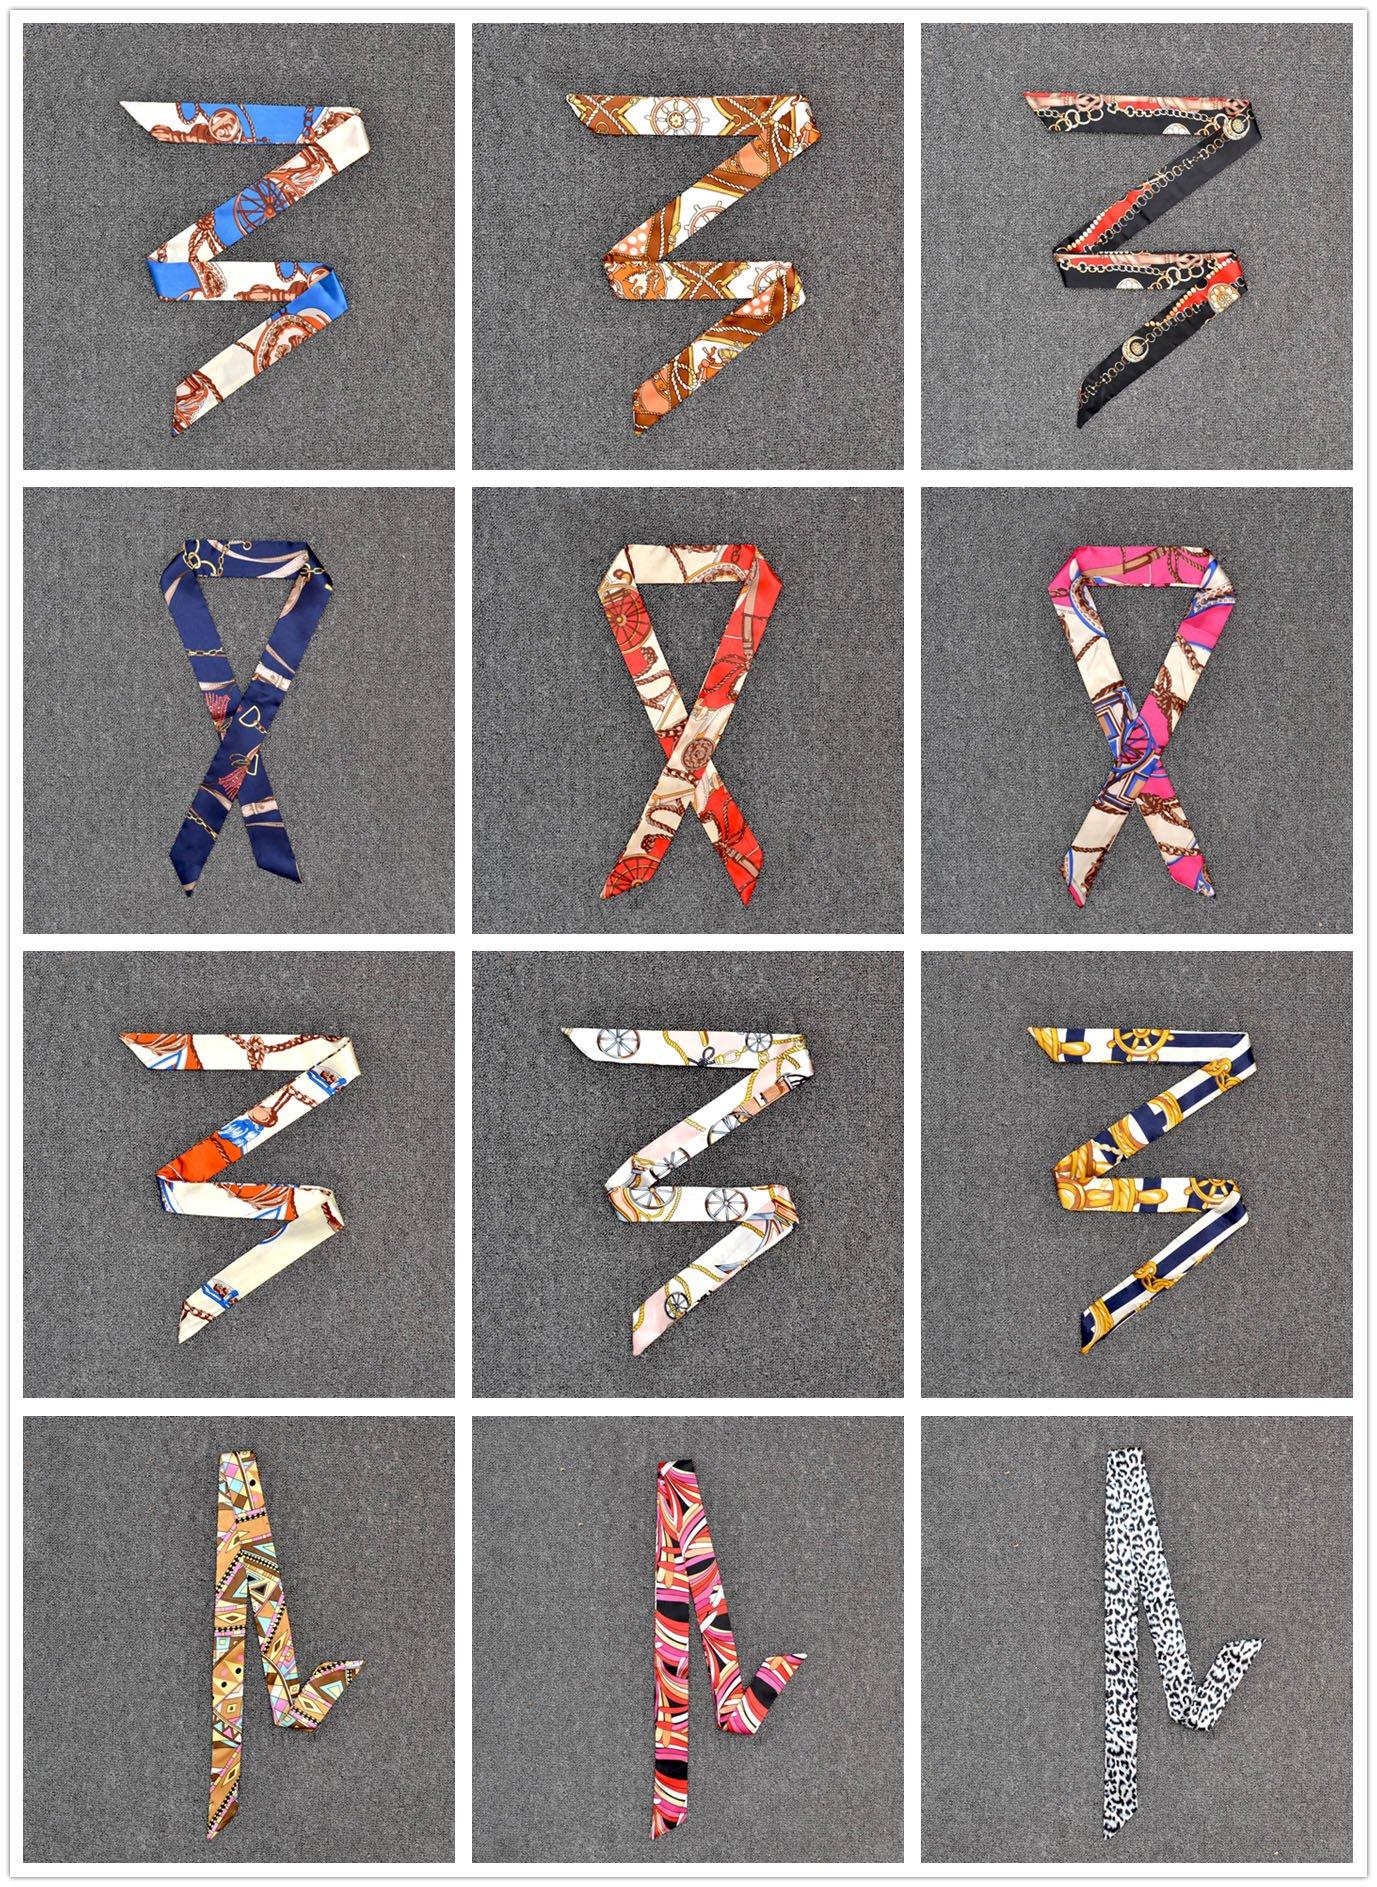 Aimyoo 24pcs Neckerchief Scarf - 12 Pairs Hairband Handbag Handle Ribbon Fashion Bag Twilly for Women Girls Decoration by Aimyoo (Image #1)